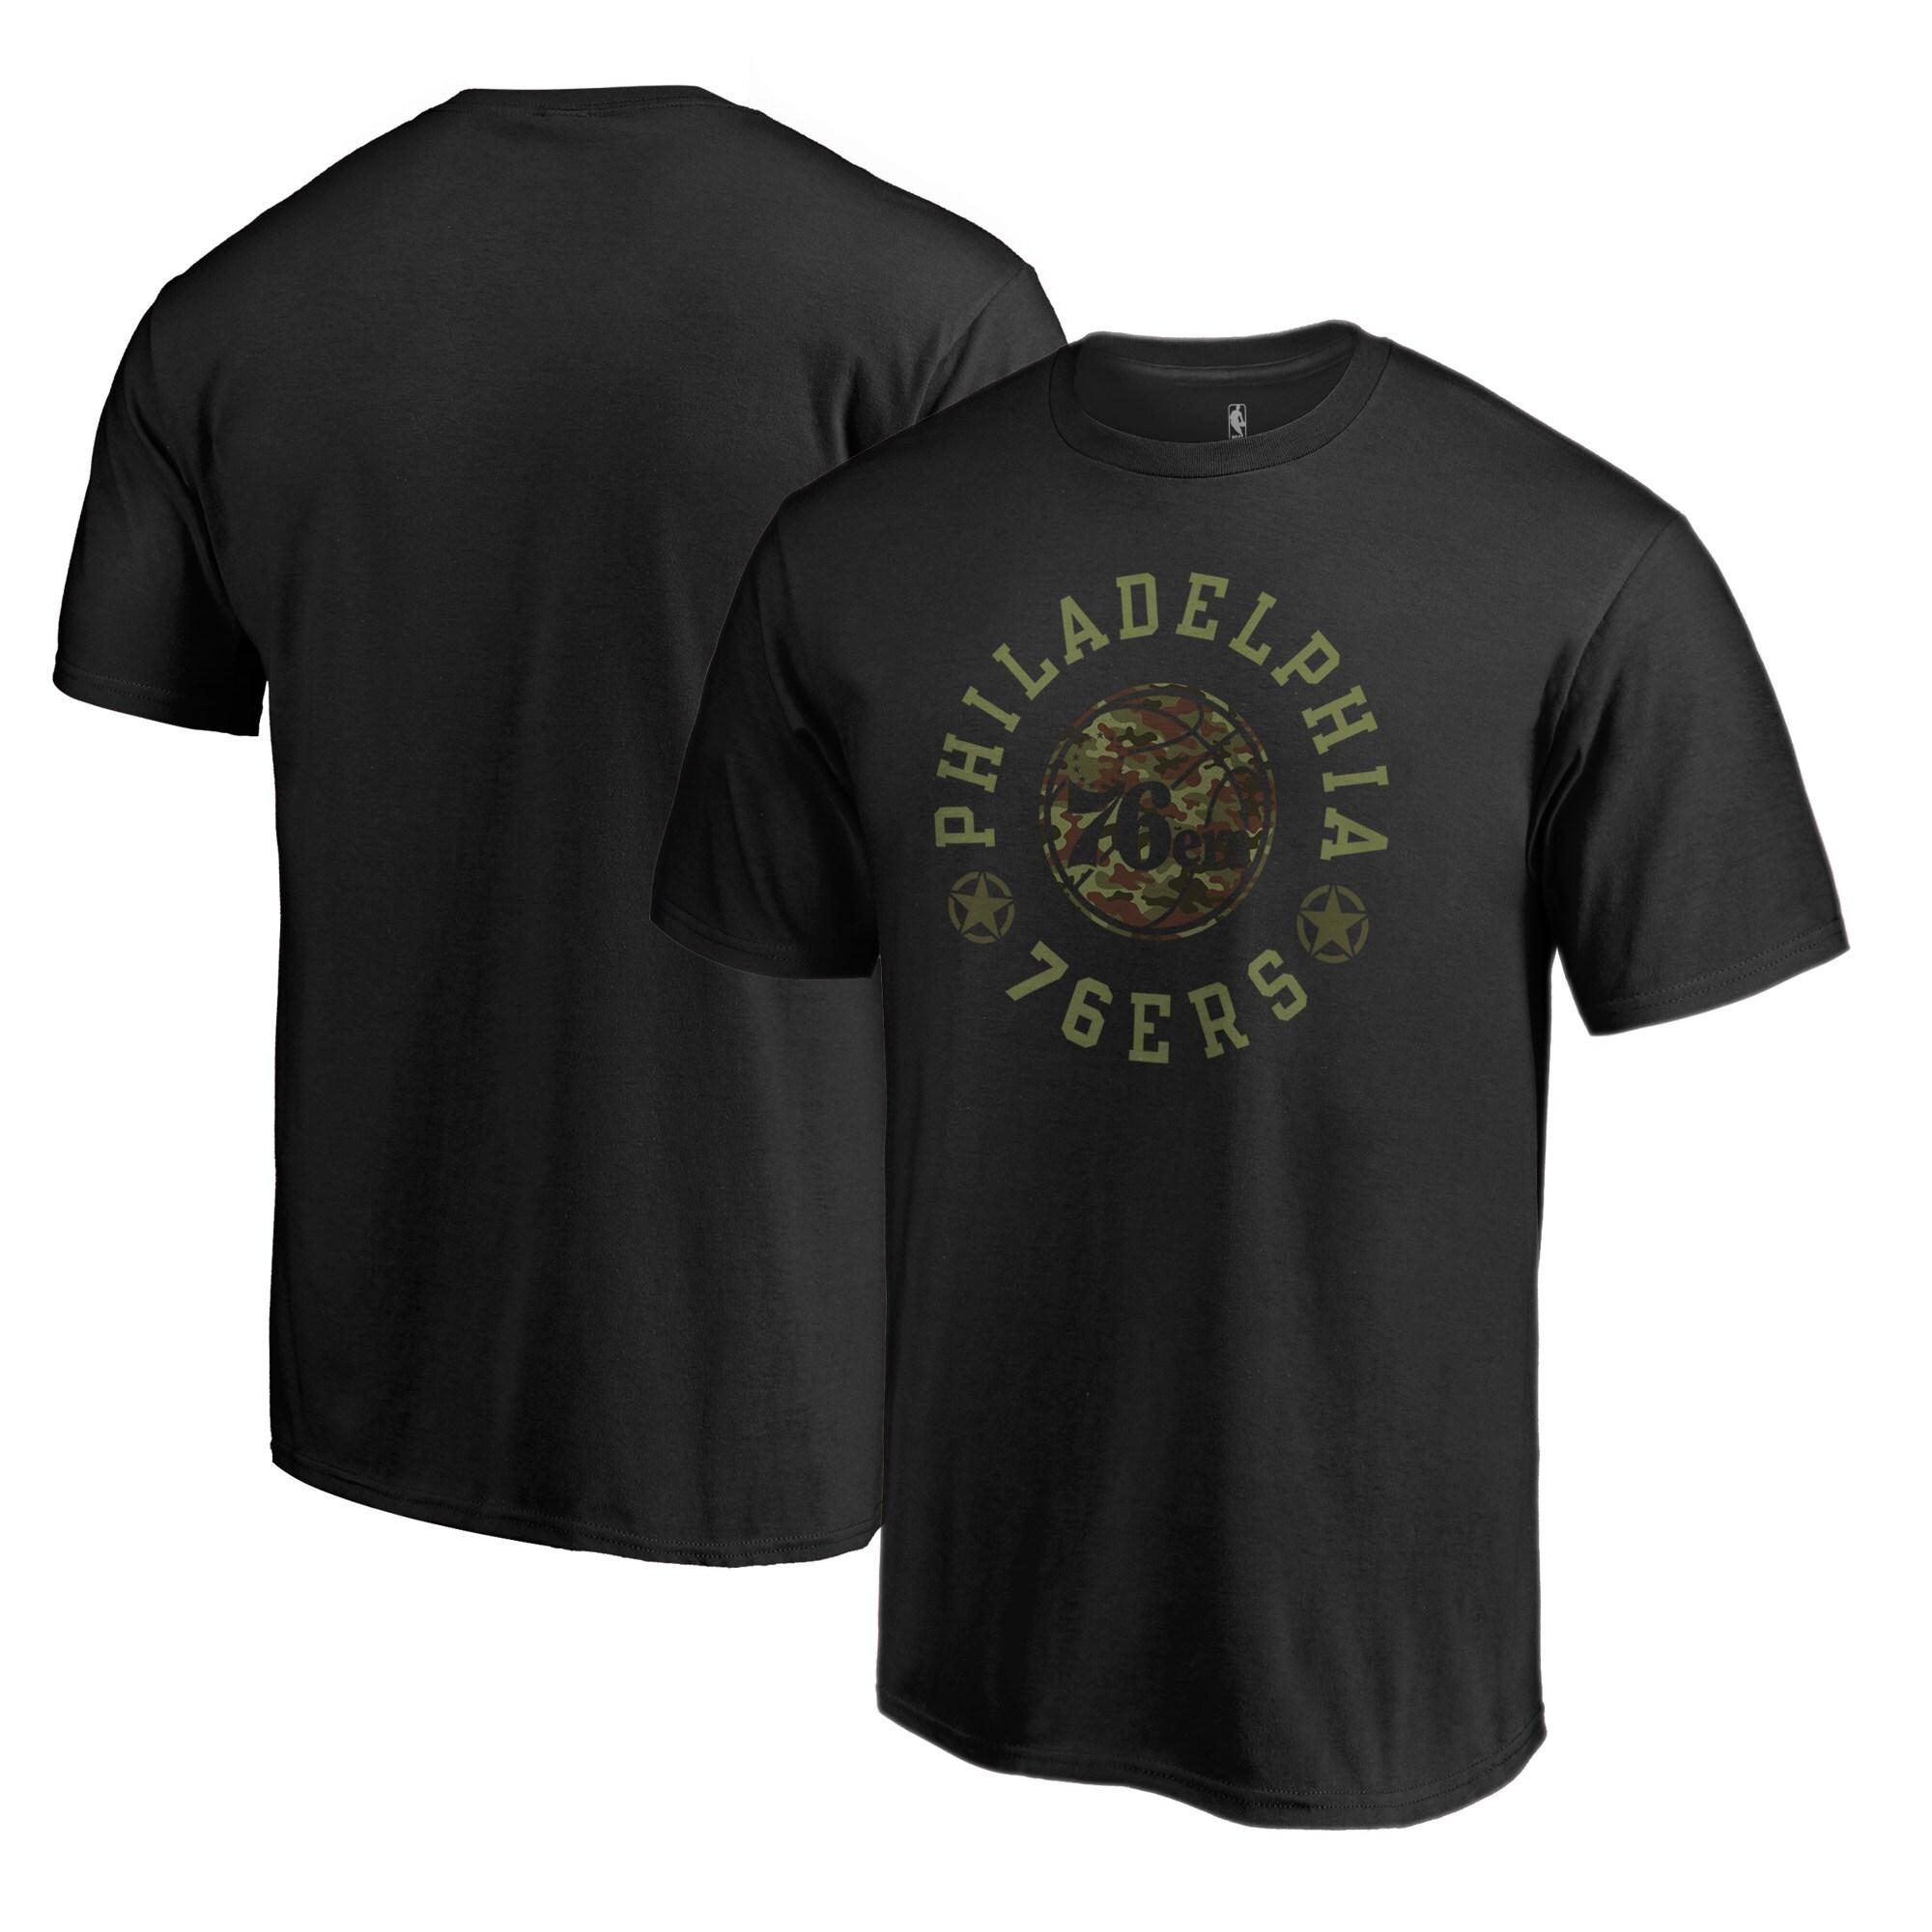 Philadelphia 76ers Fanatics Branded Liberty T-Shirt - Black